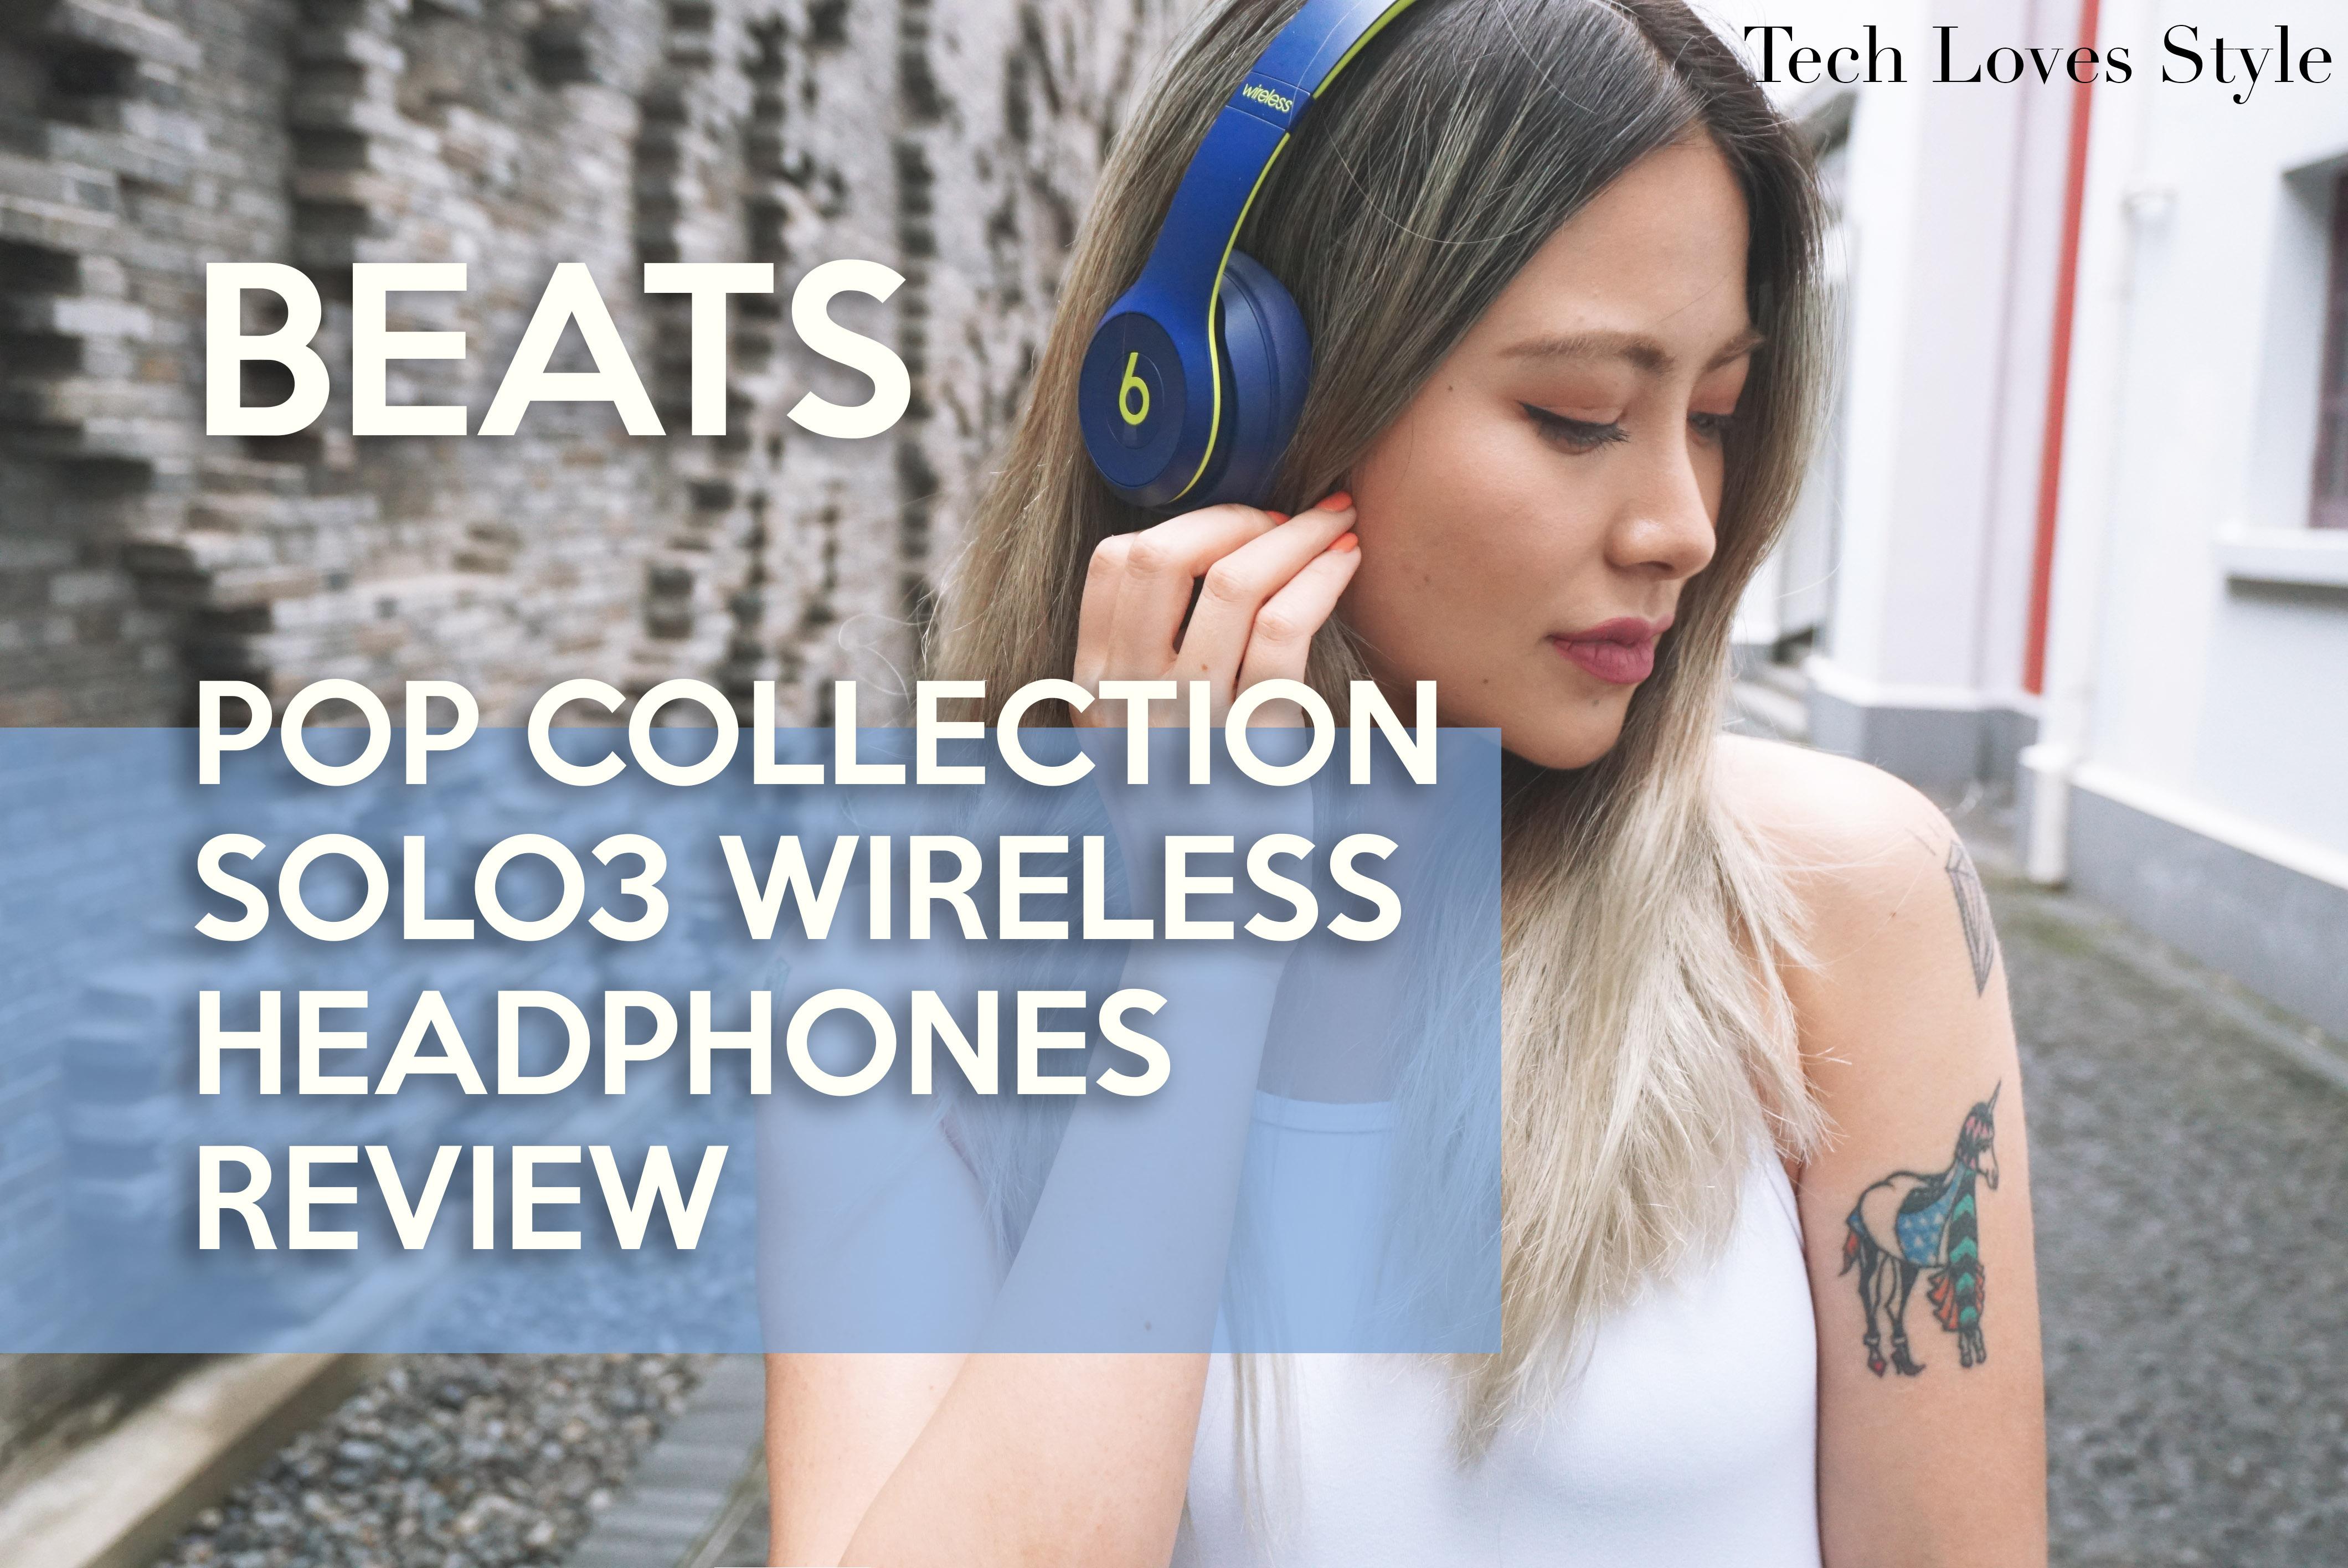 fa6ead9c61e Beats Pop Collection Solo 3 Wireless Headphones Review by Yarina   An  Award-Winning Luxury Fashion Tech Blog   TechLovesStyle